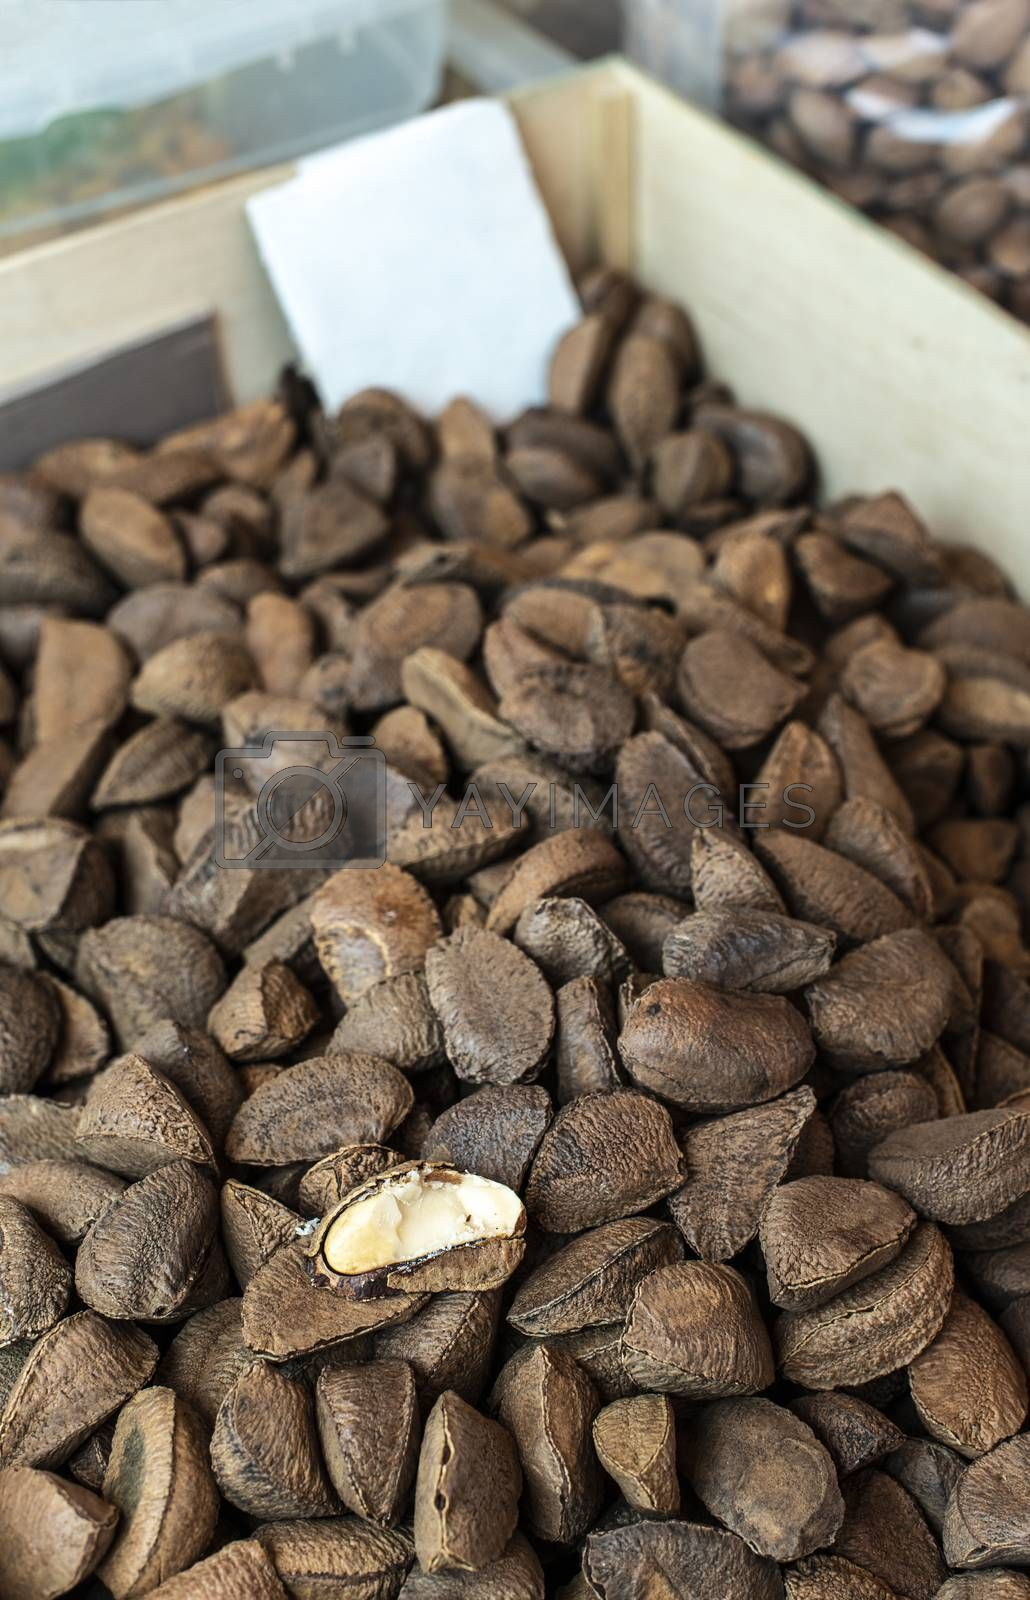 Brazilian nuts on the market. Brazilian nuts with shells.